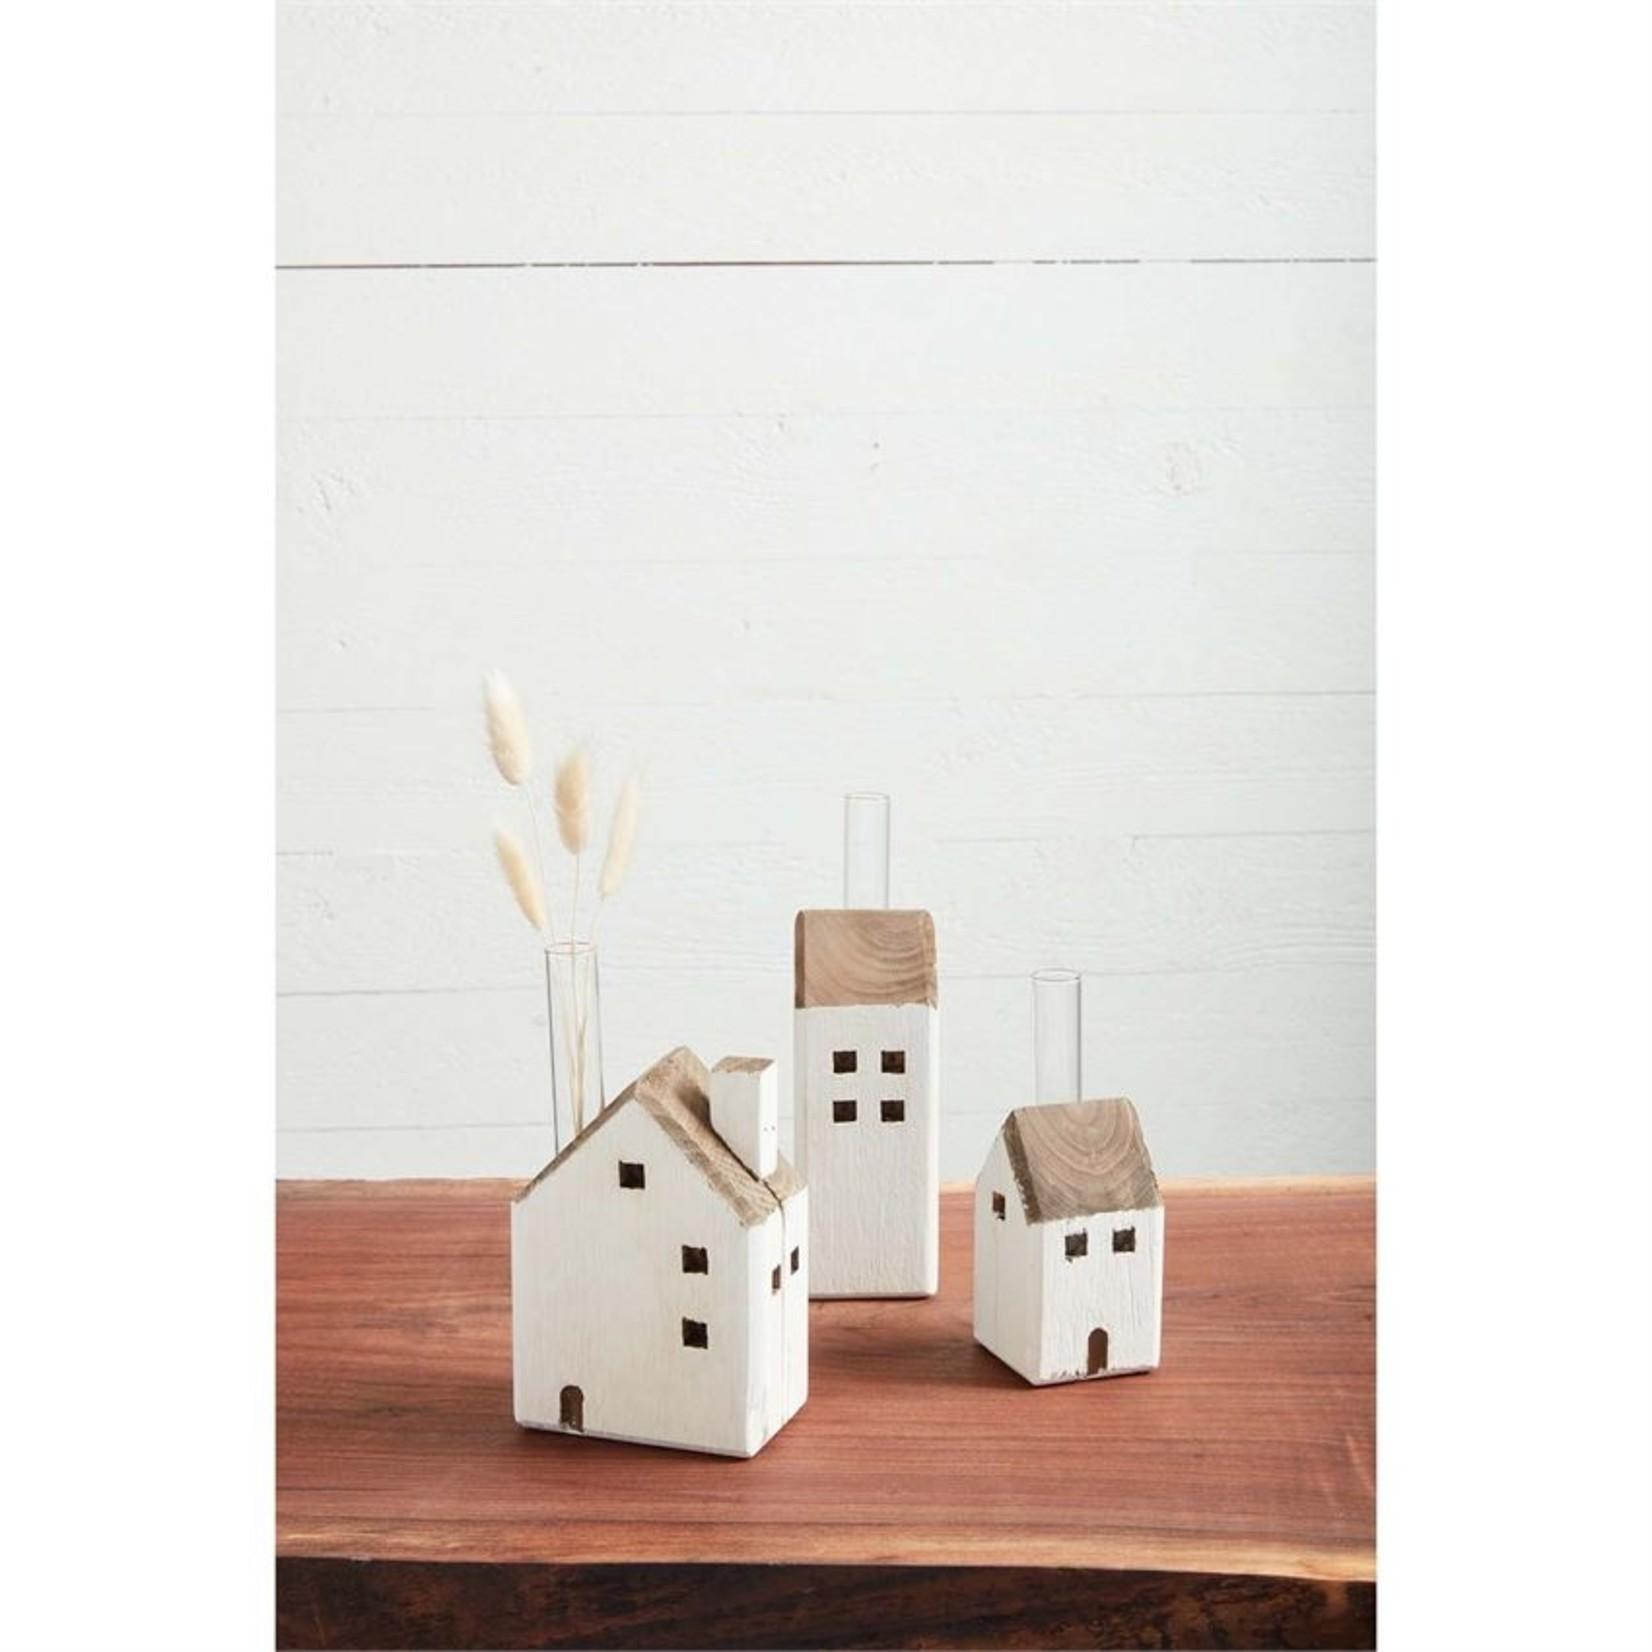 House Bud Vases (Multiple Sizes)